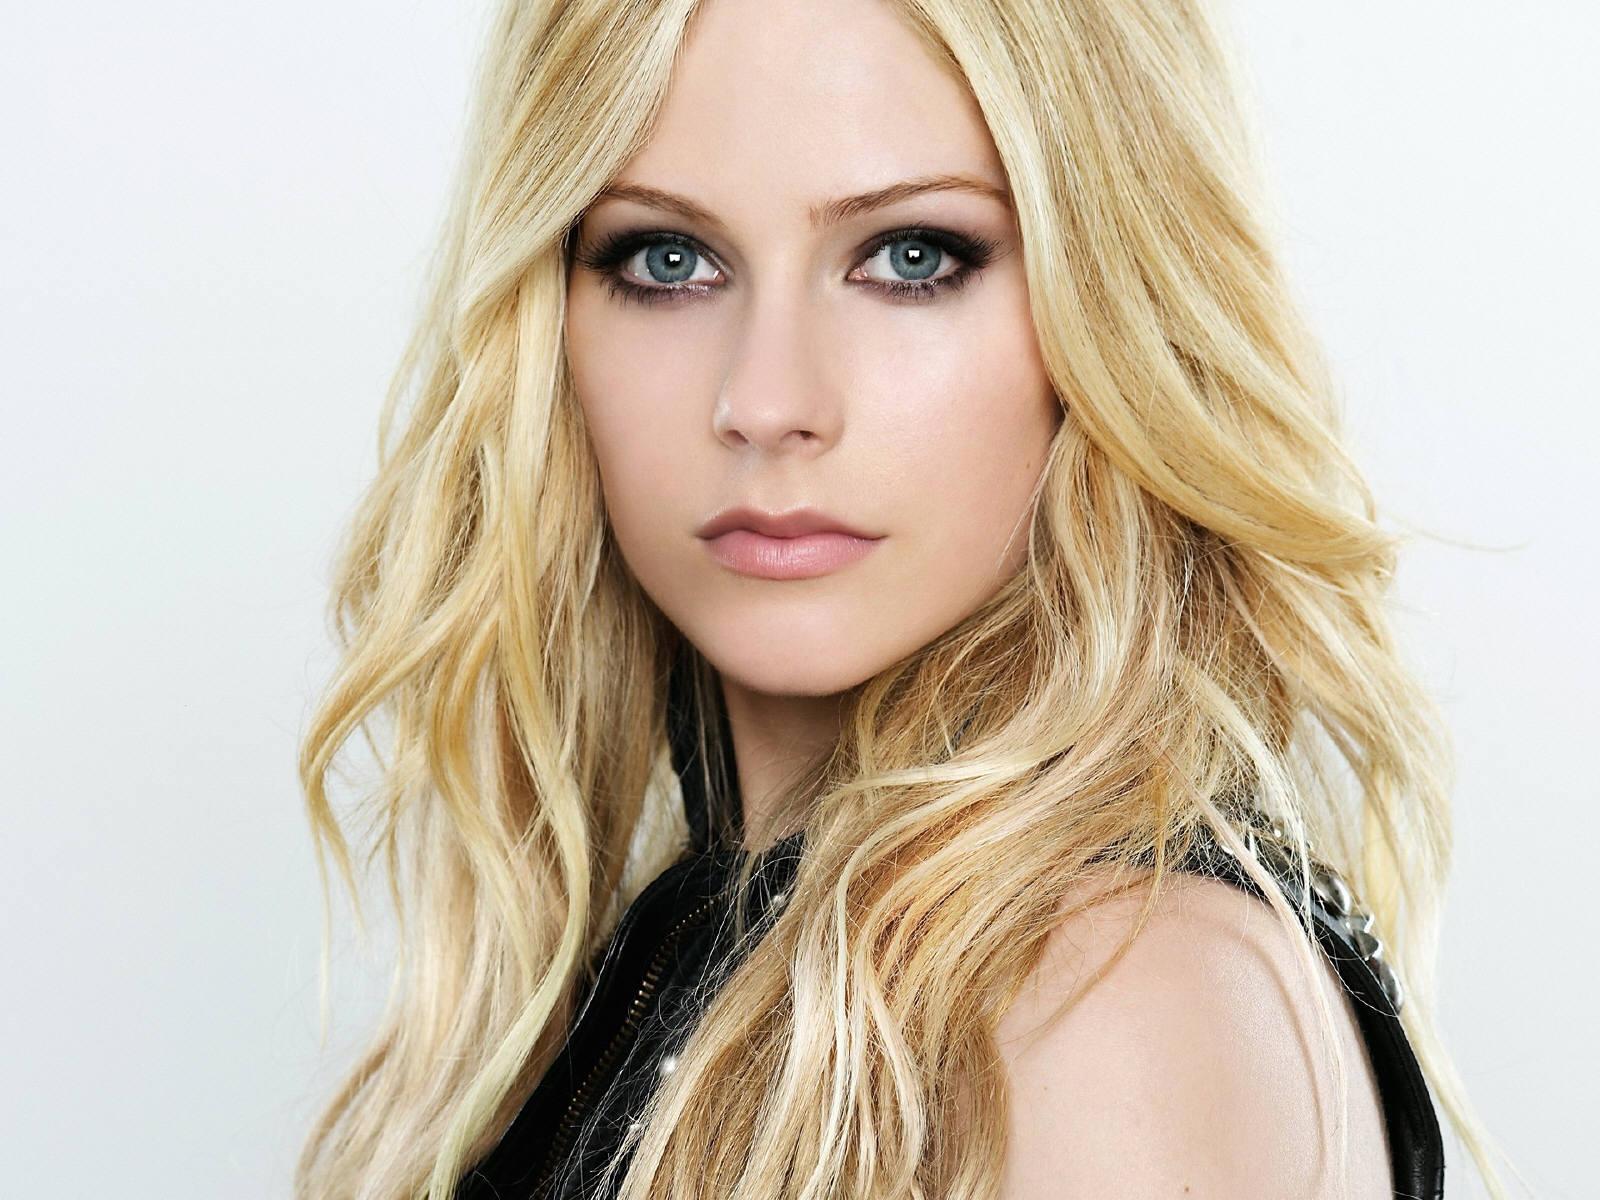 http://4.bp.blogspot.com/-bEMim4kadtA/Ty4gn2COemI/AAAAAAAABQQ/2fQ2g4OejxU/s1600/Portrait-of-Avril-Lavigne.jpg